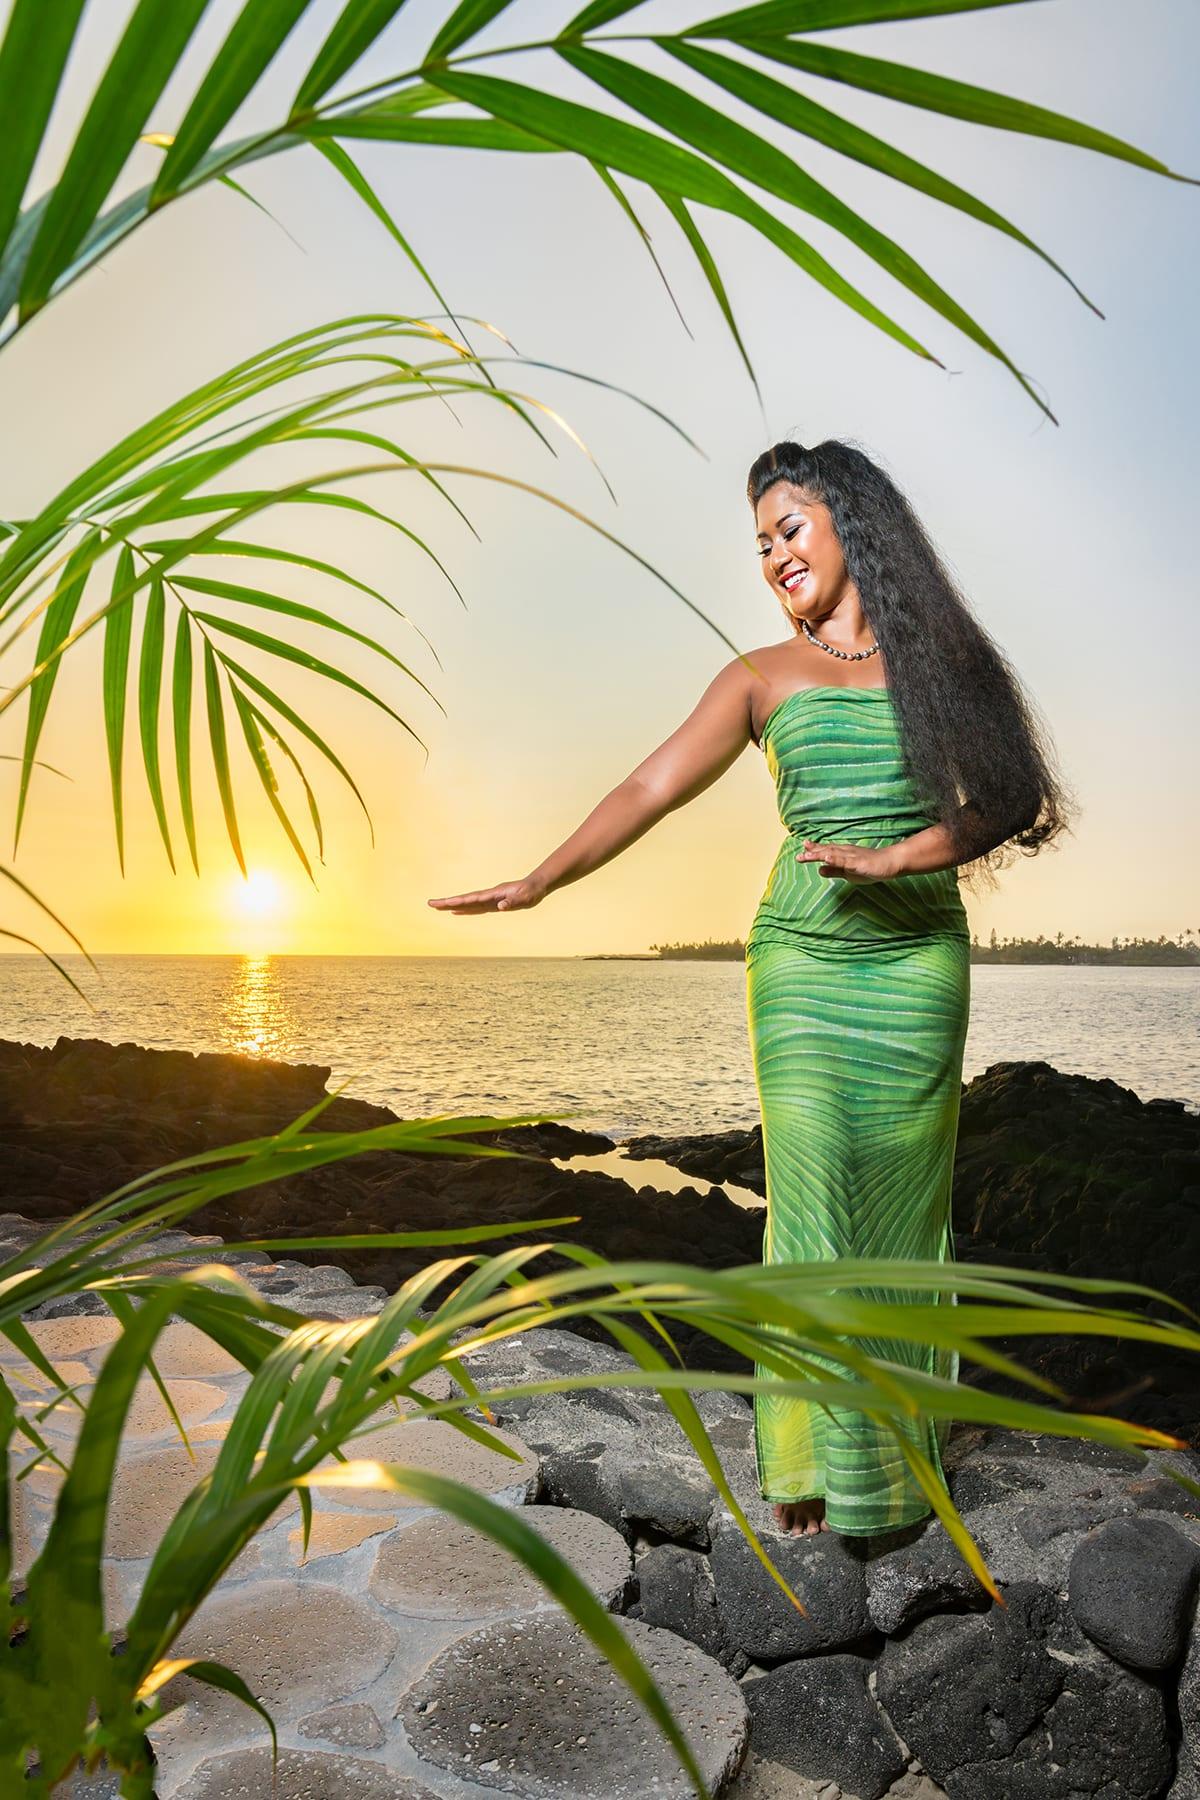 Hawaiian-Dancer-Photographer-Performer-Portrait-Headshot.jpg